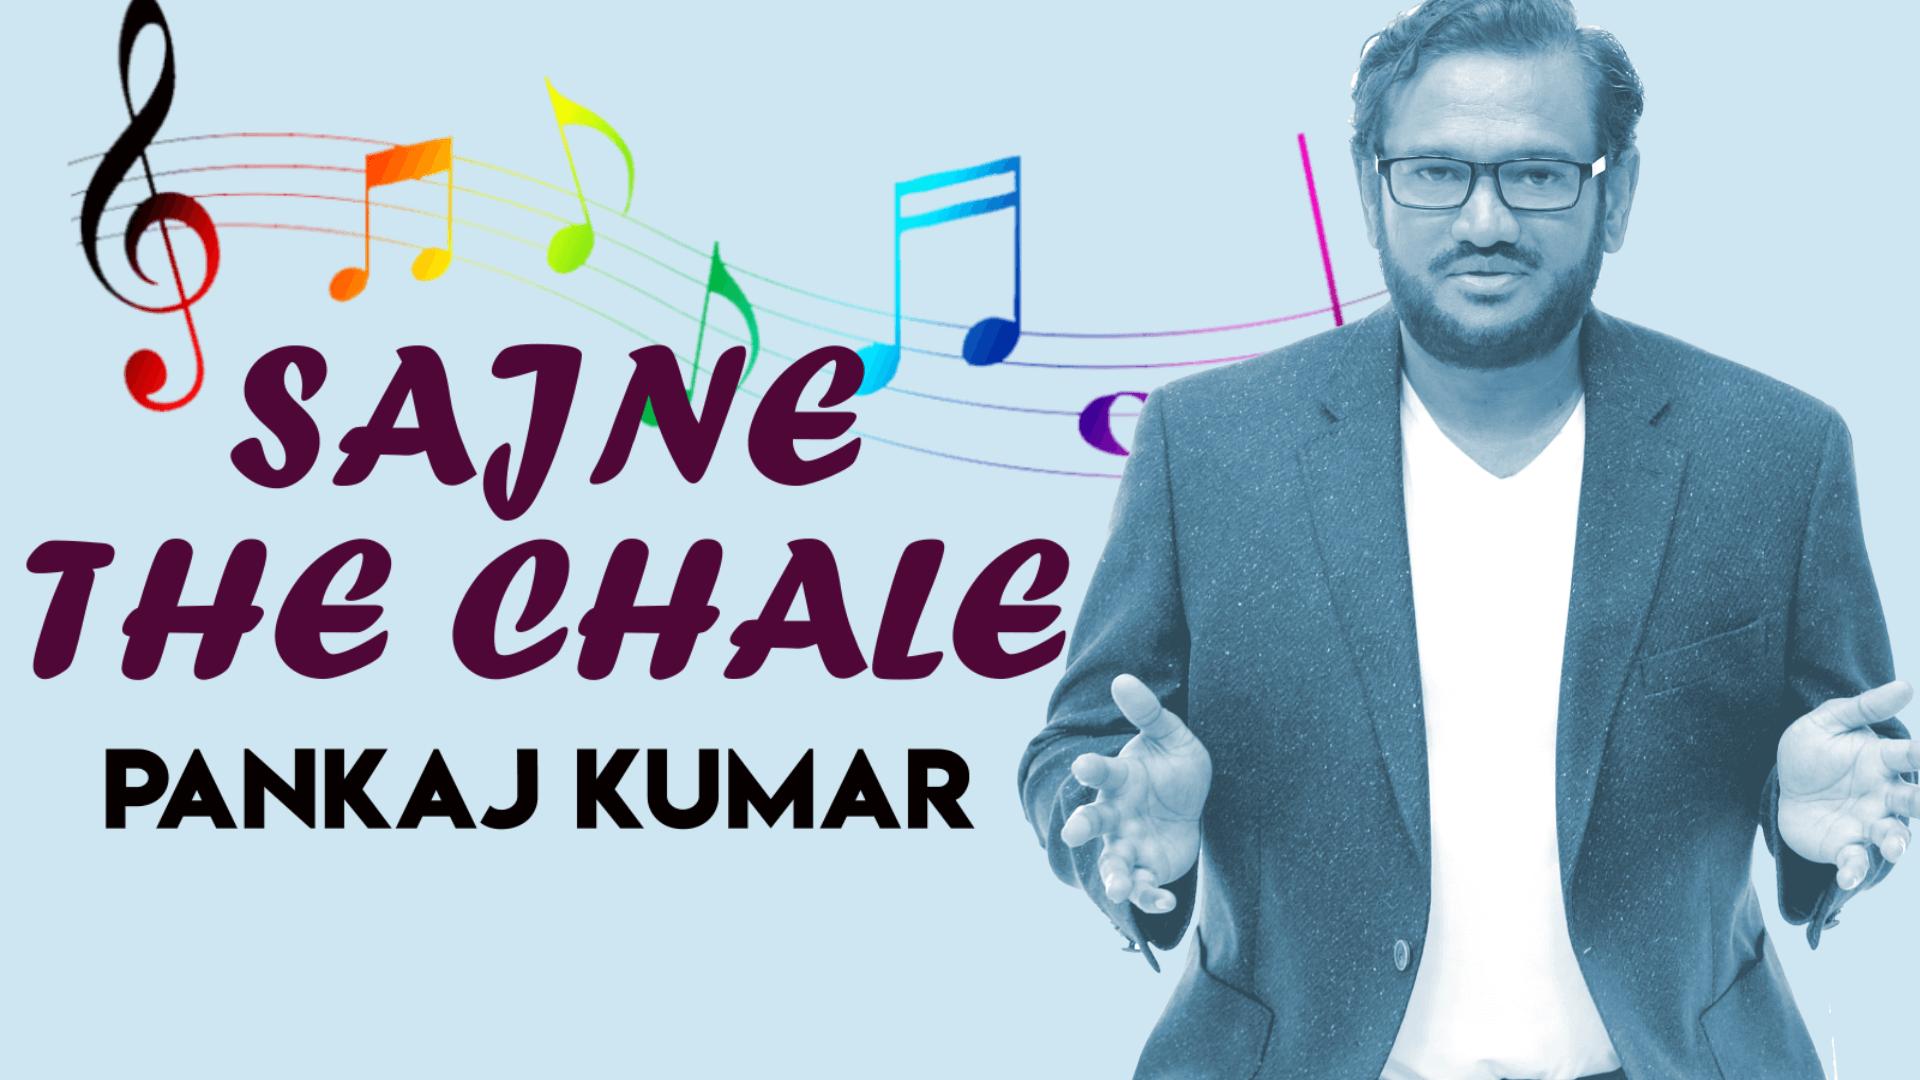 Sajne they chale | Pankaj Kumar